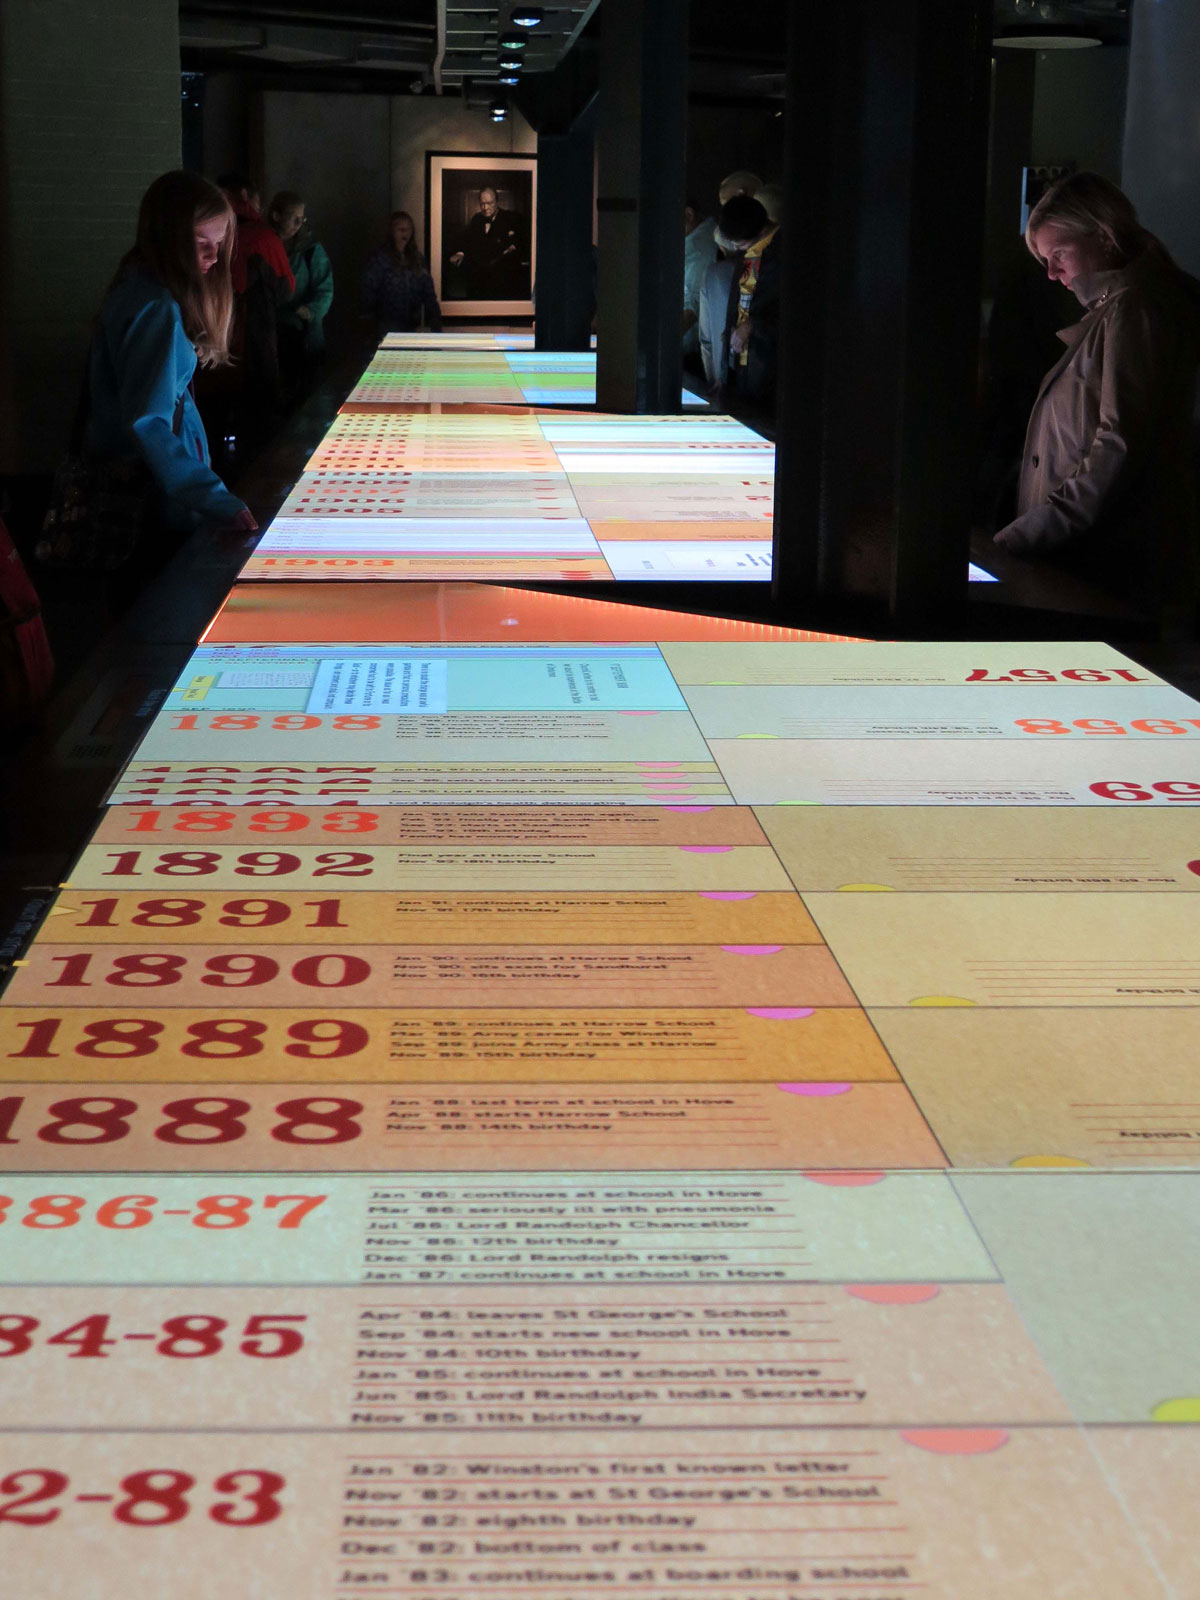 Interactive Winston Churchill Lifeline in the Churchill Museum